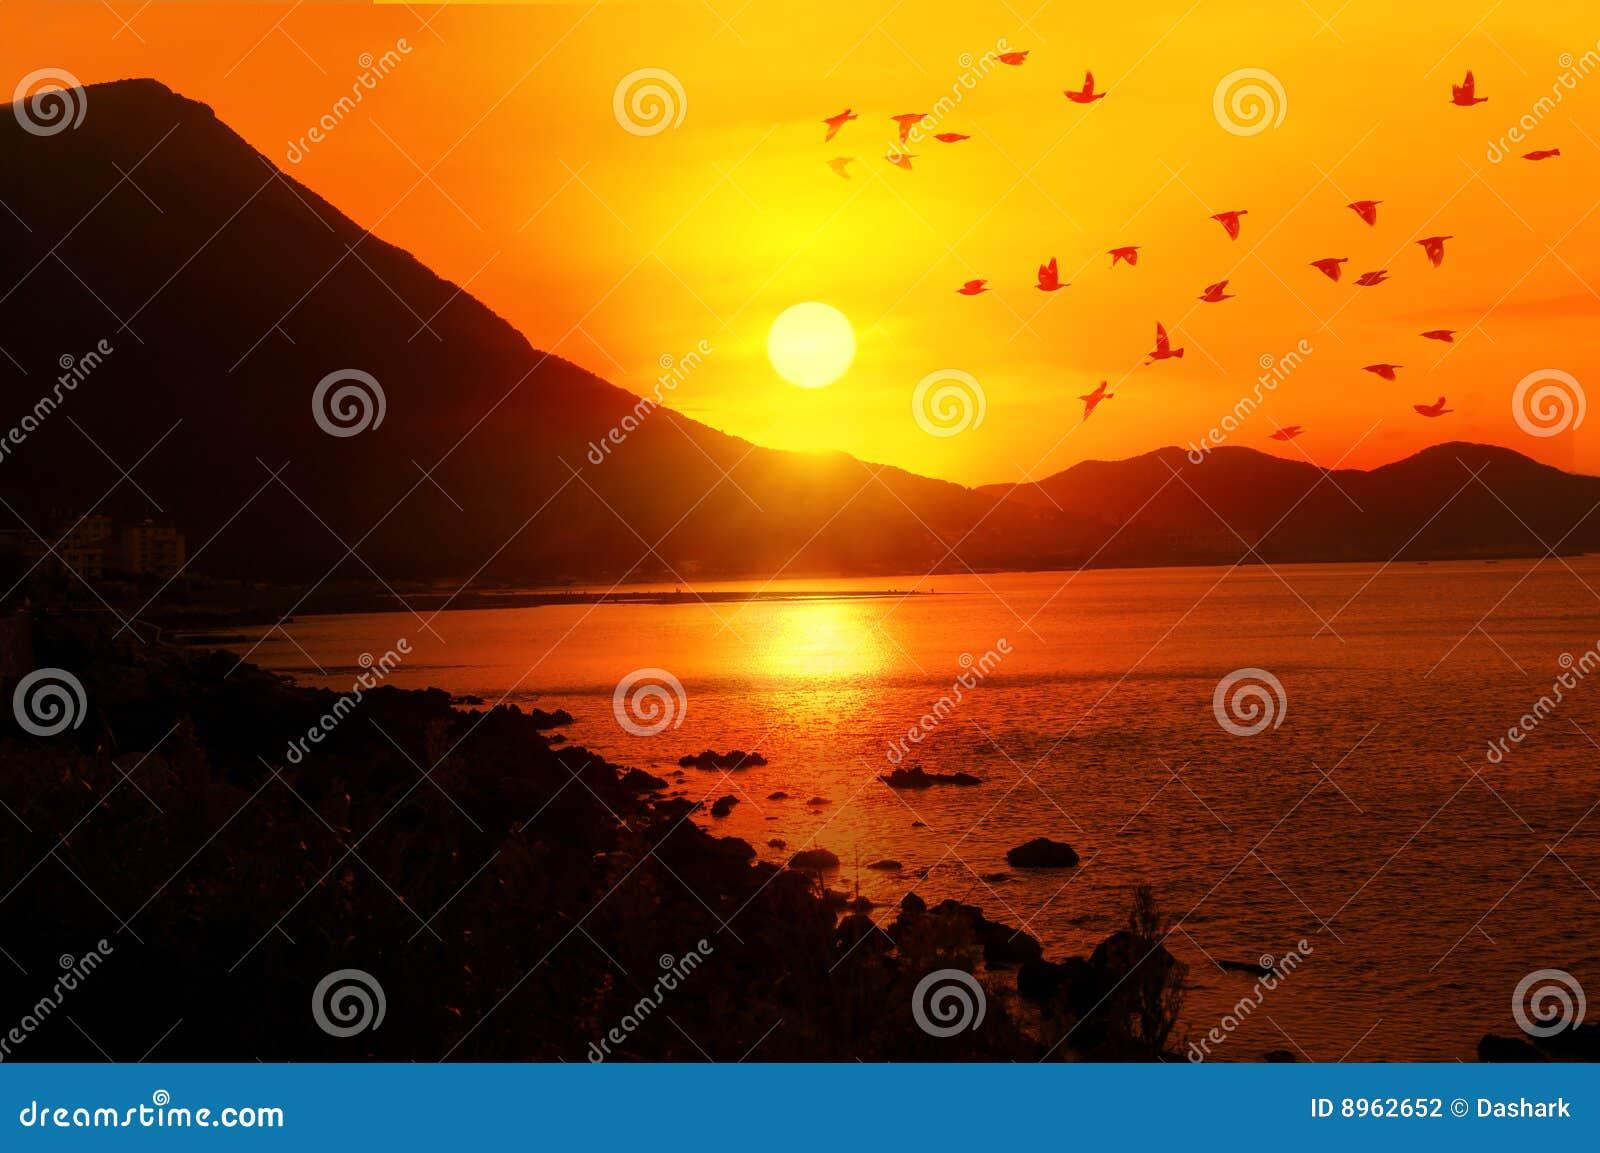 Stock Photography Birds Flying Image8962652